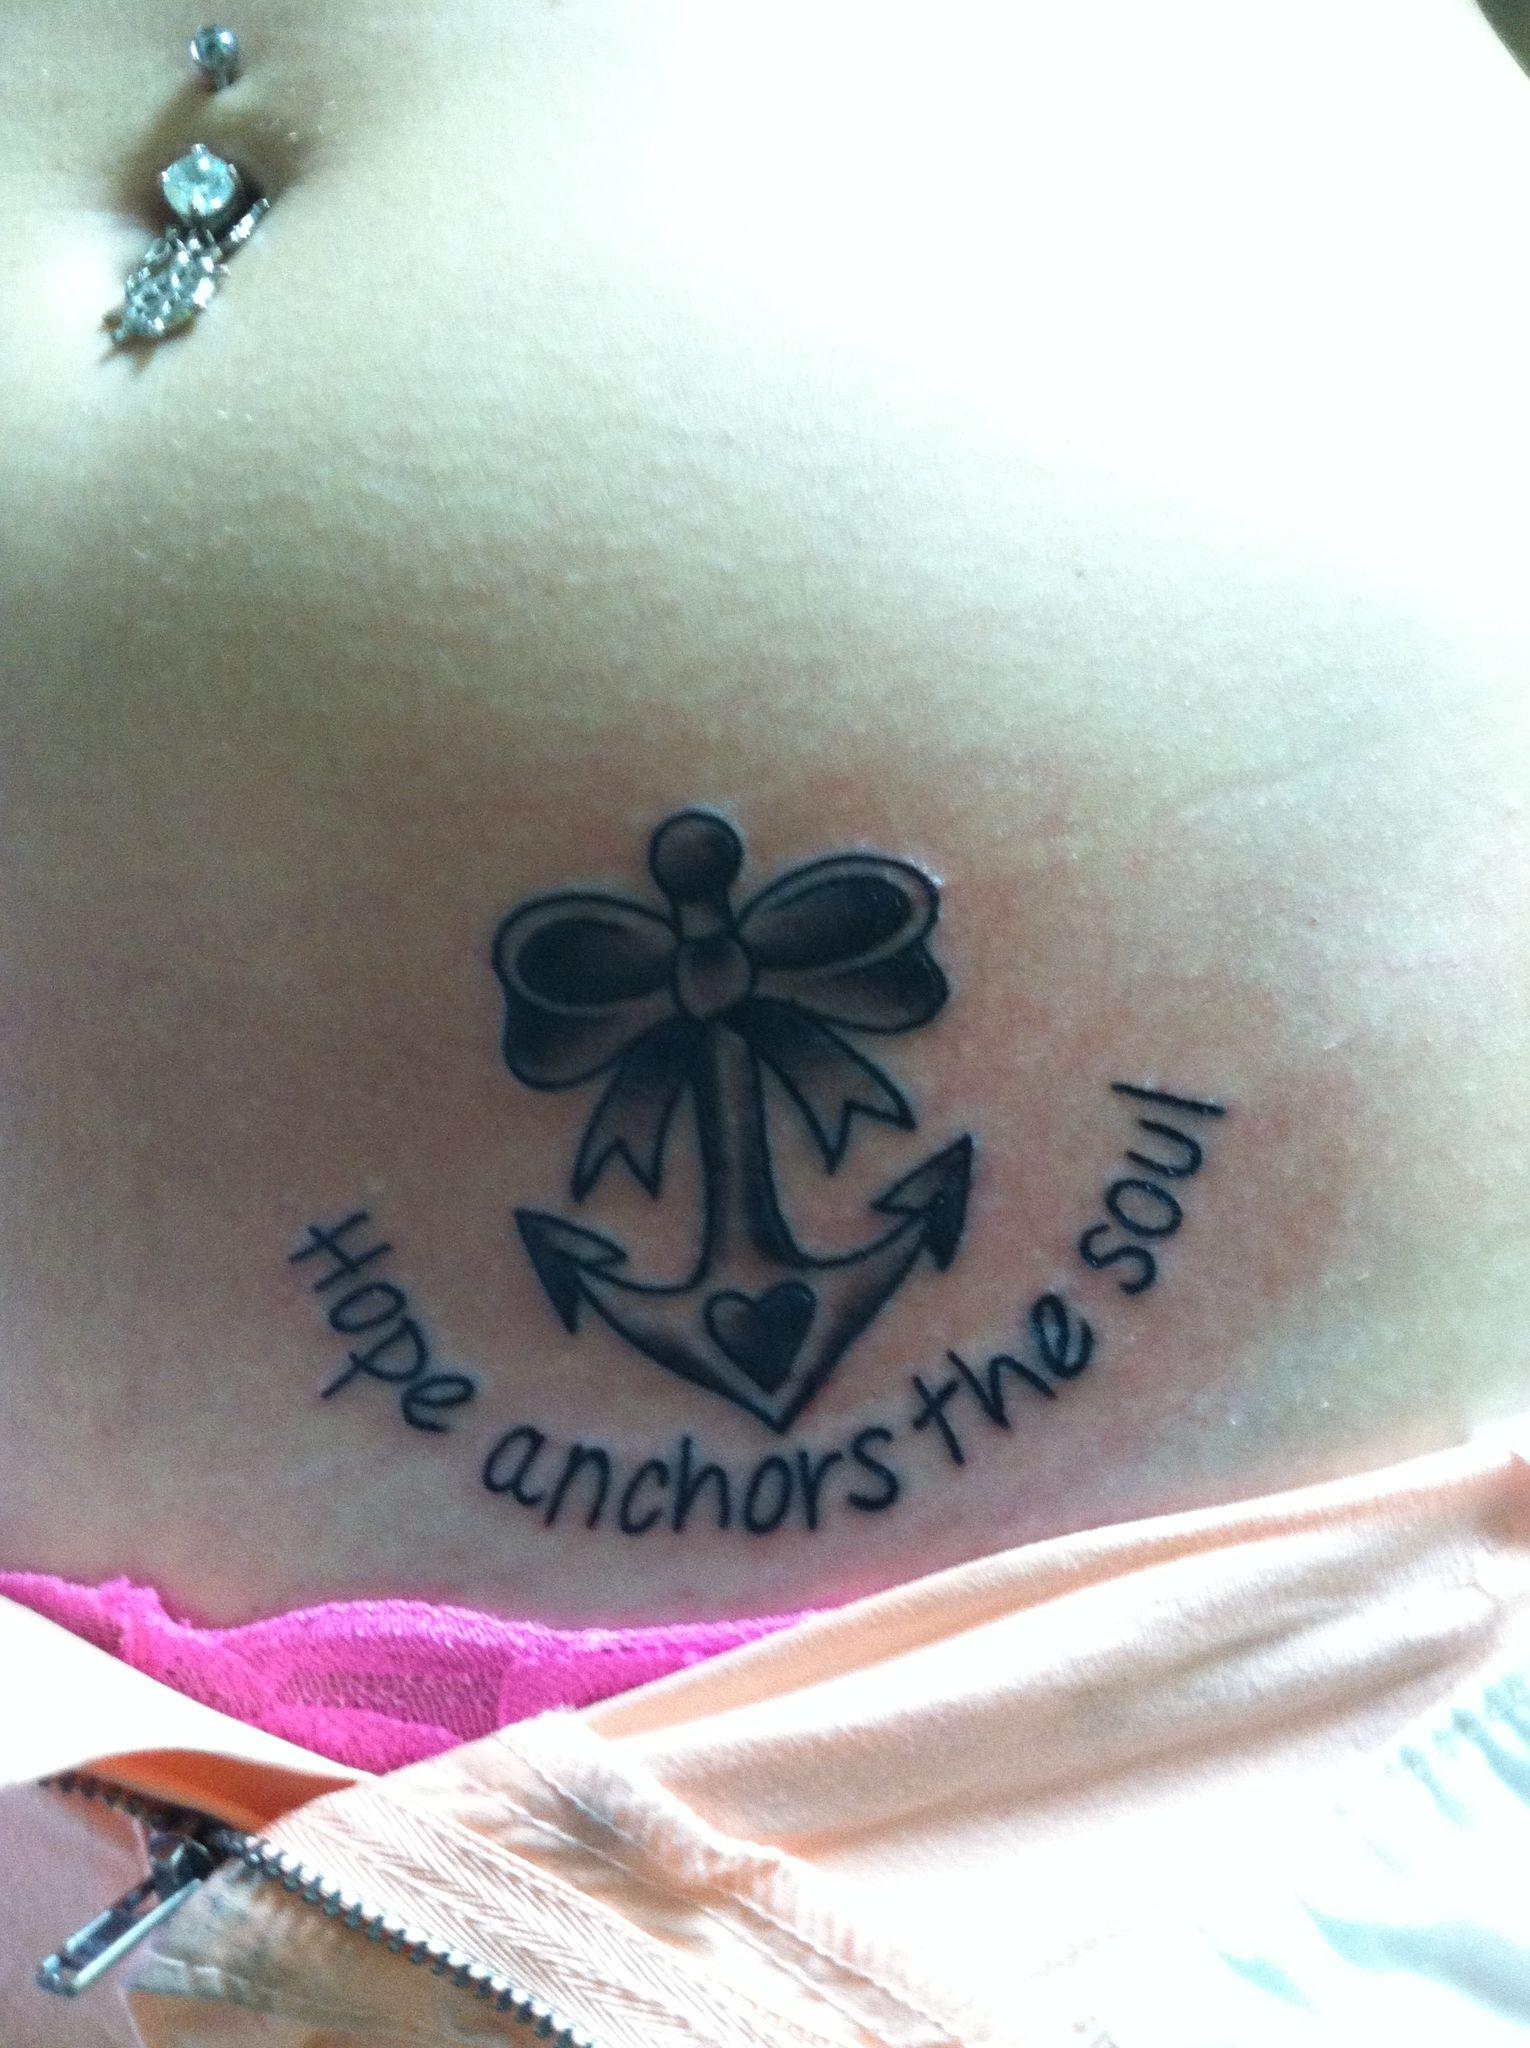 Hope anchors the soul tattoo tattoo pinterest soul for Hope anchors the soul tattoo